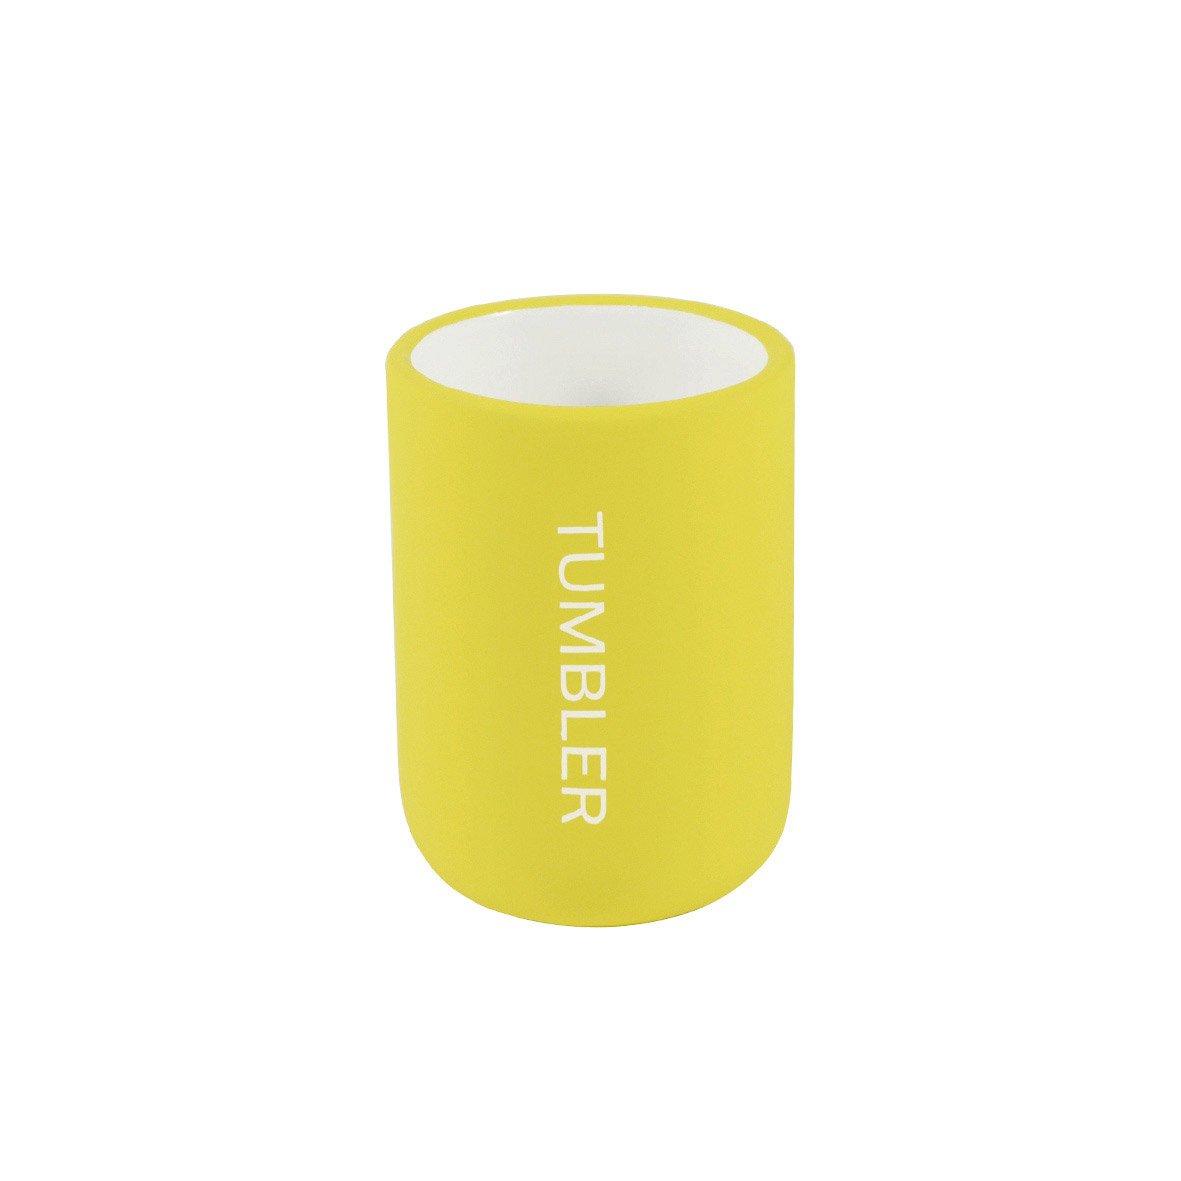 Gobelet céramique Bubble gum, banana n°4